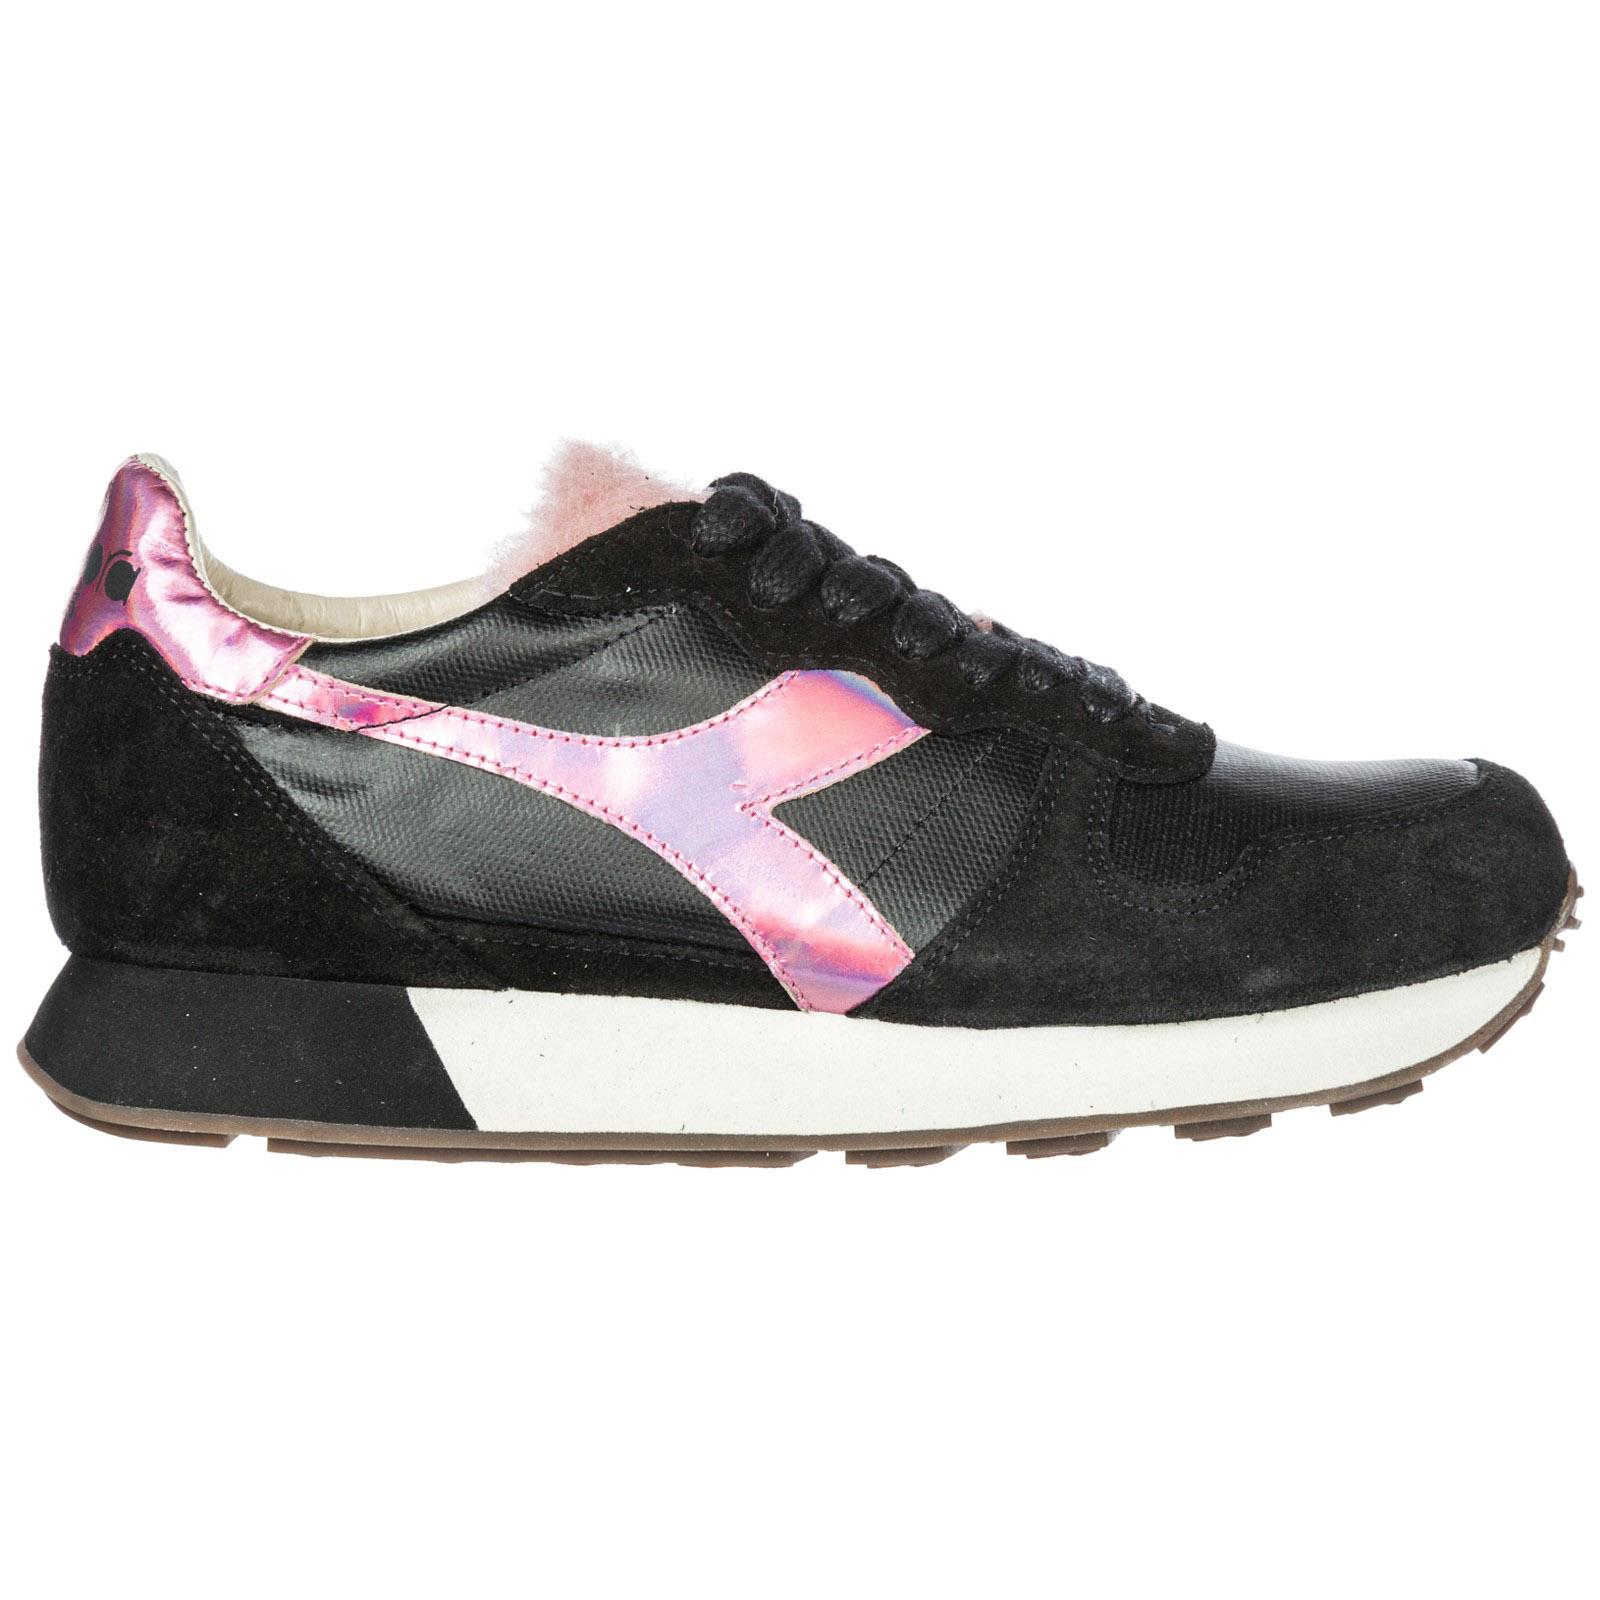 Scarpe sneakers donna camoscio camaro h